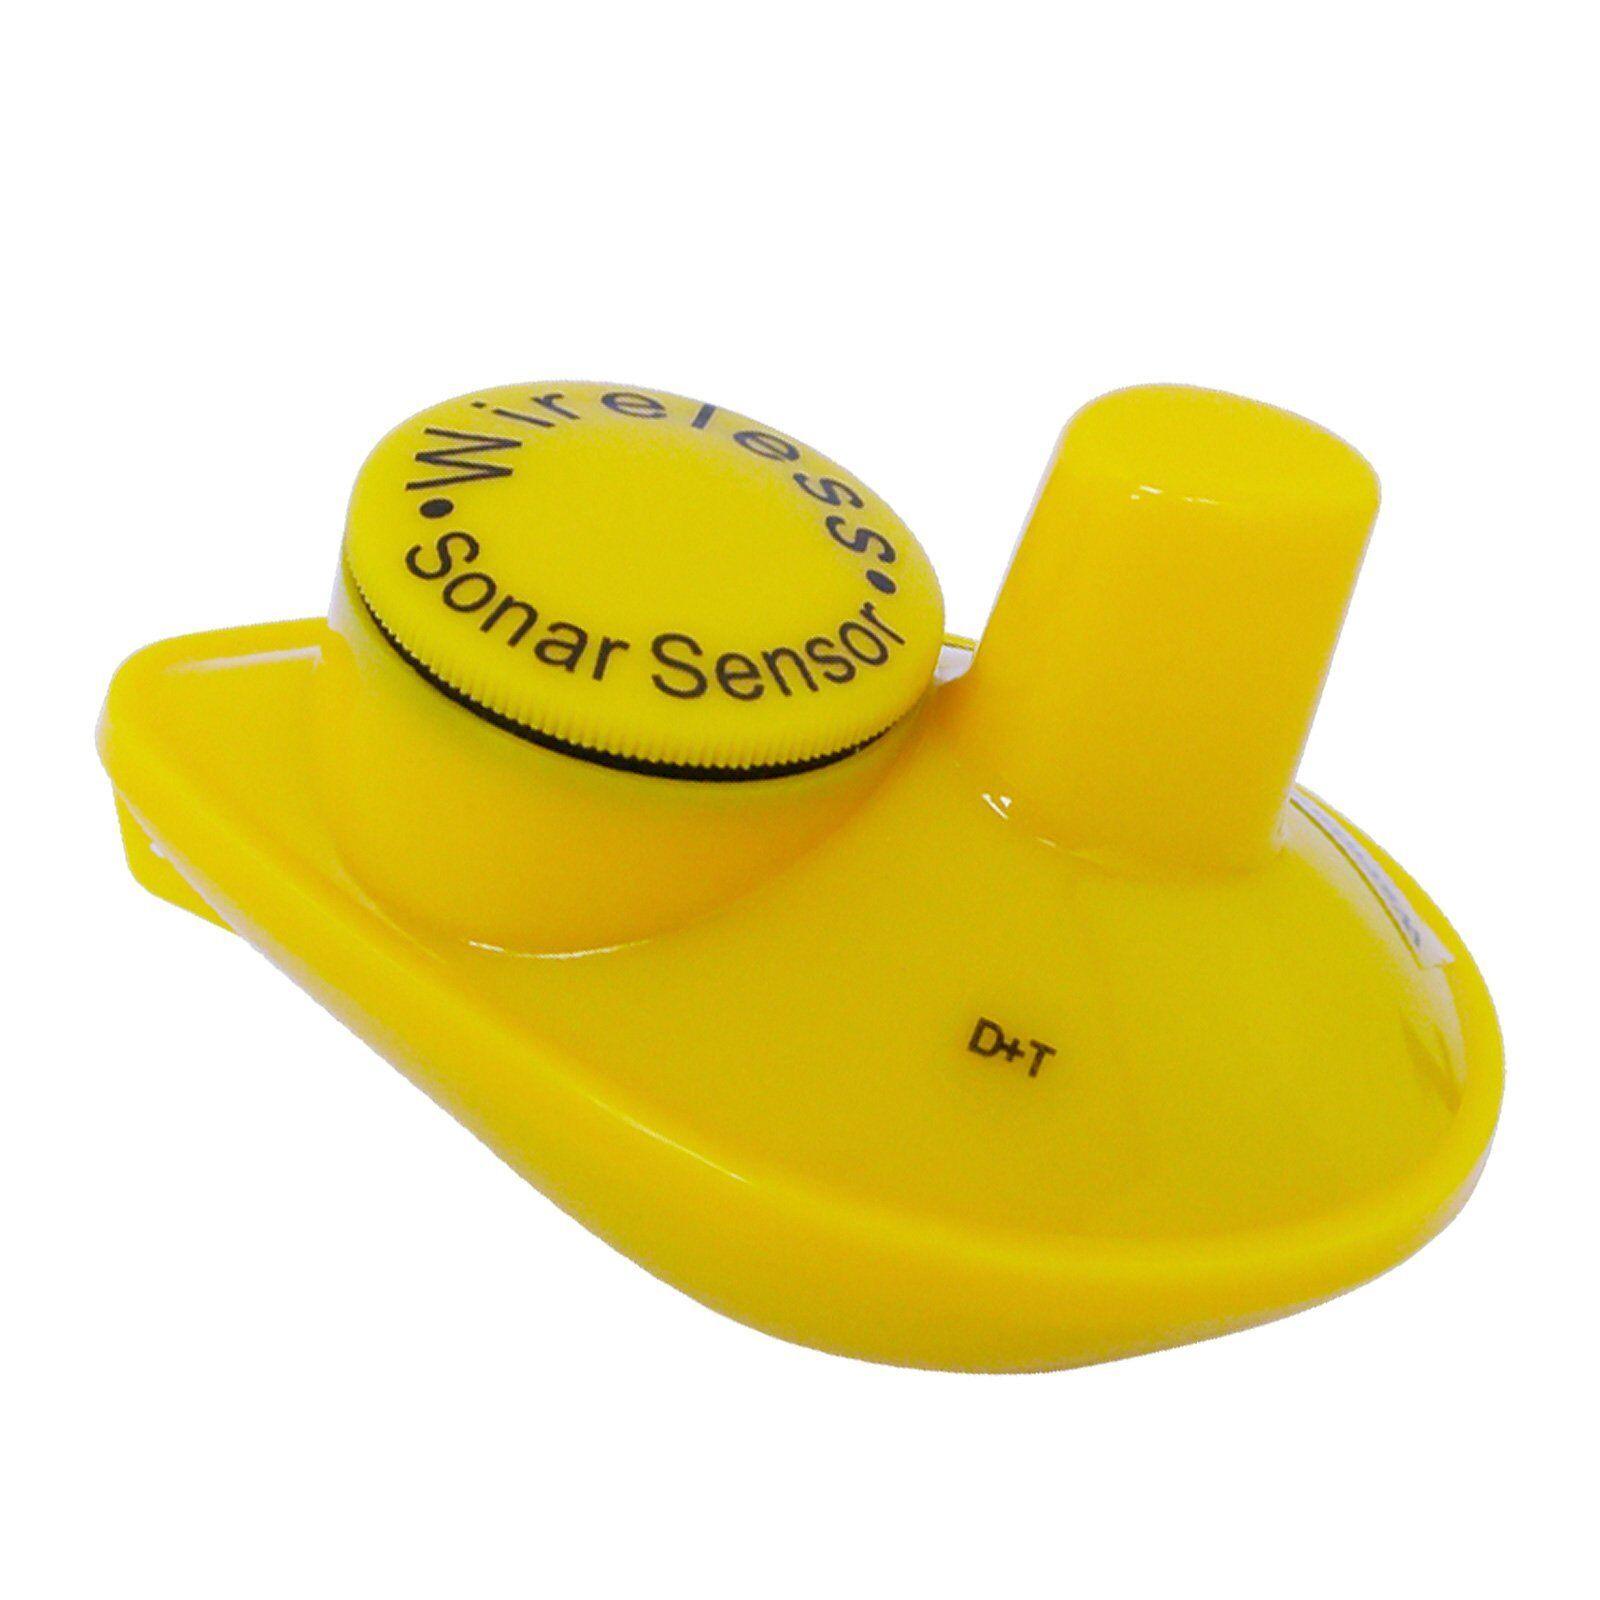 Professionale Impermeabile Pesce Finder Cablata & Senza Fili Sensore Sensore Sensore 328ft/ 100m 00c2f7